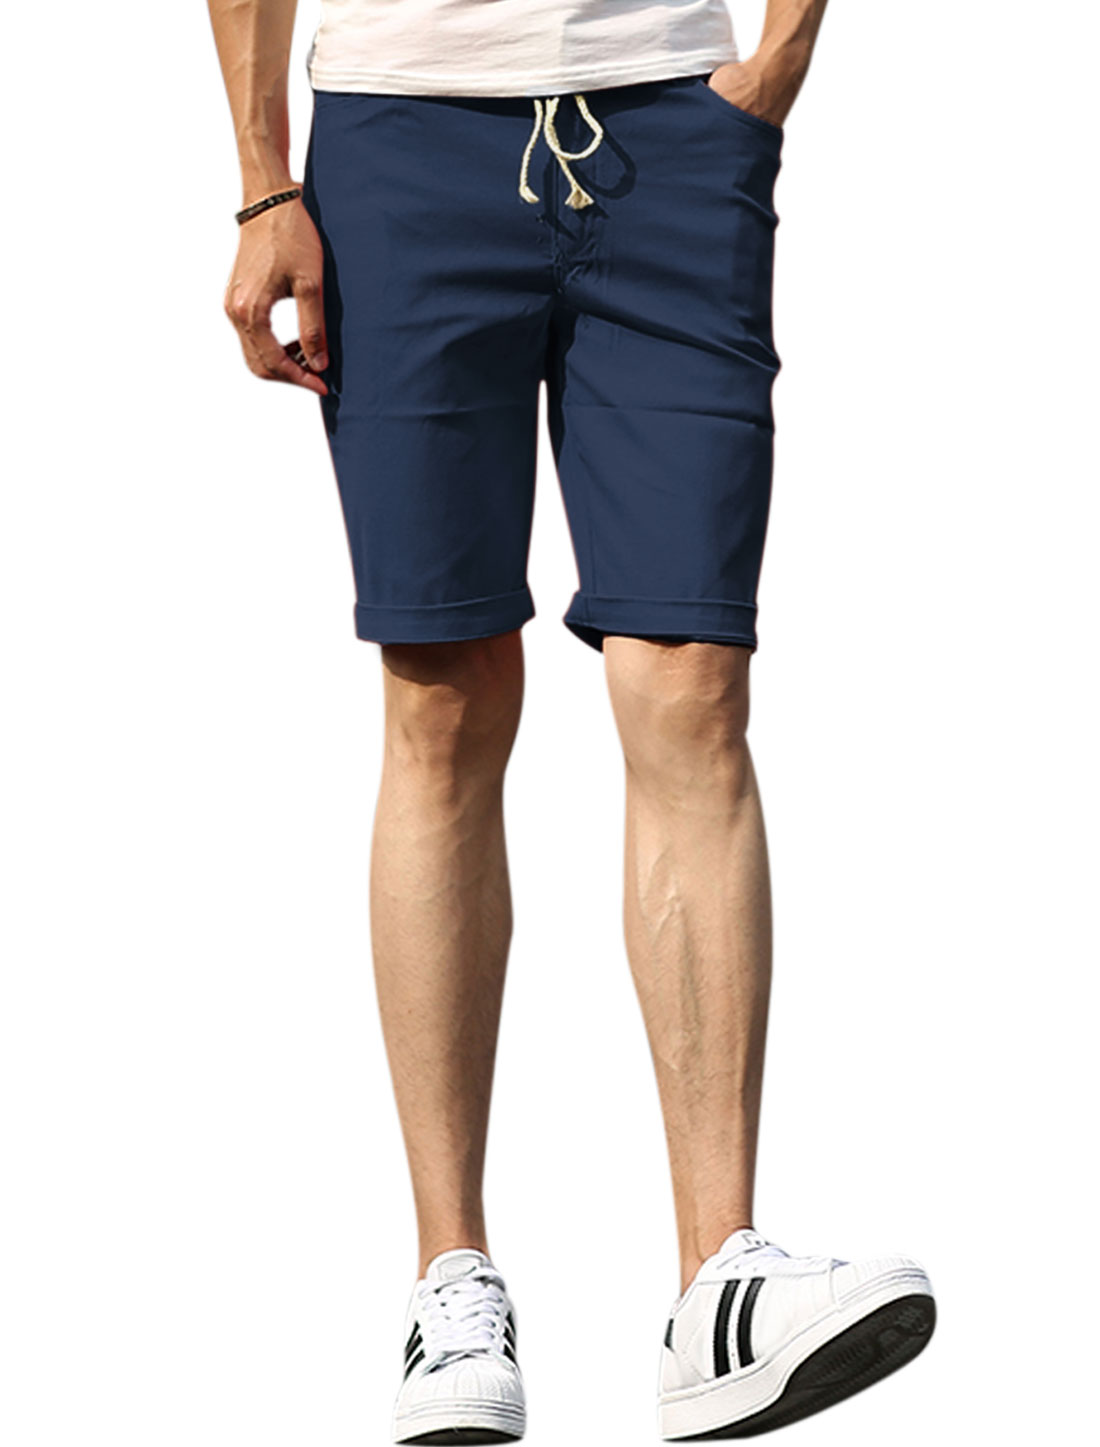 Men Elastic Drawstring Waist Mid Rise Five Pockets Shorts Navy Blue W32